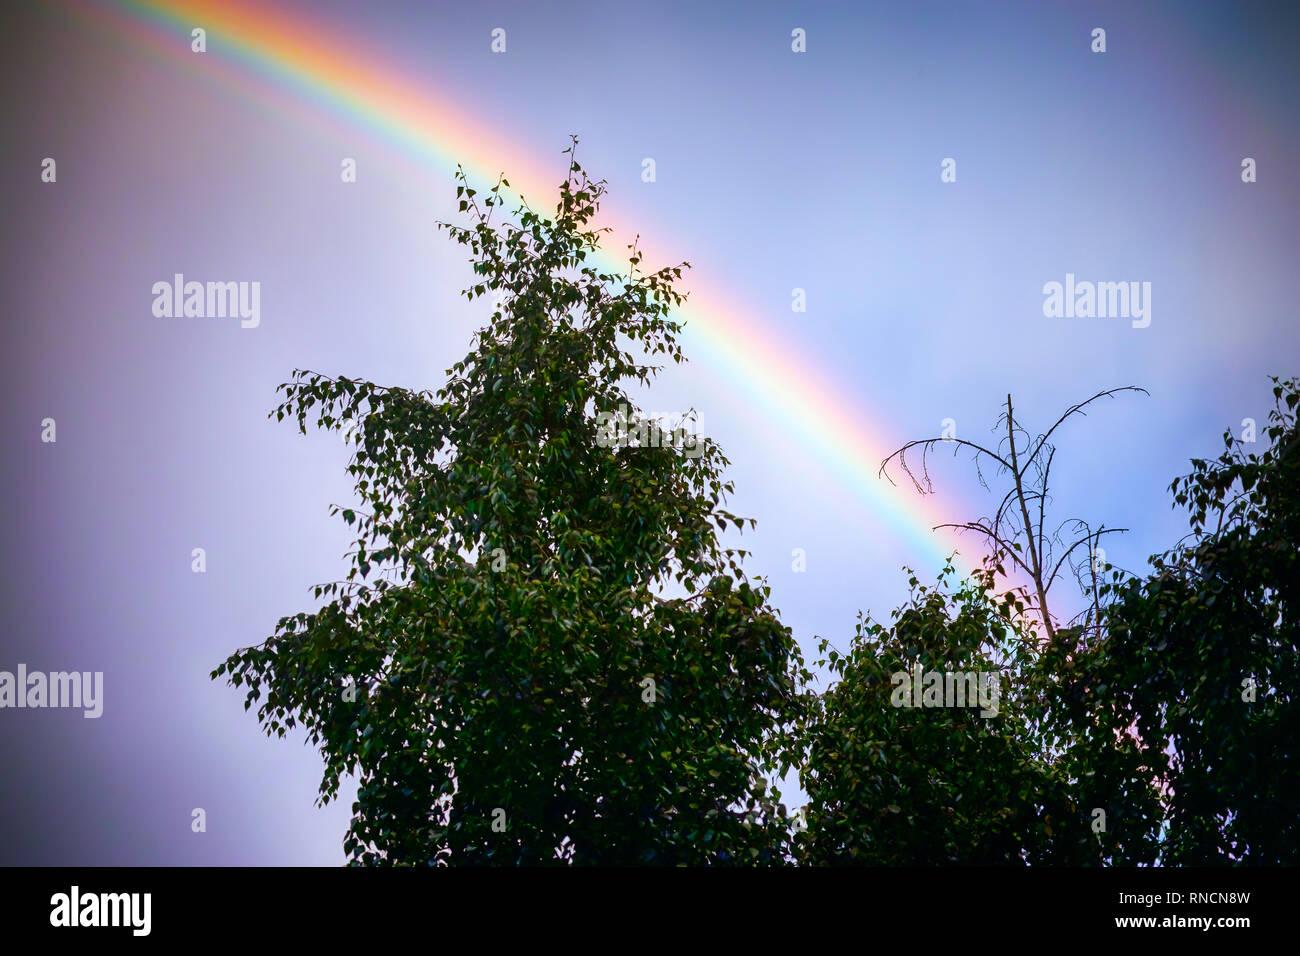 Regenbogen über Himmel. Natürliches Phänomen. Stockbild